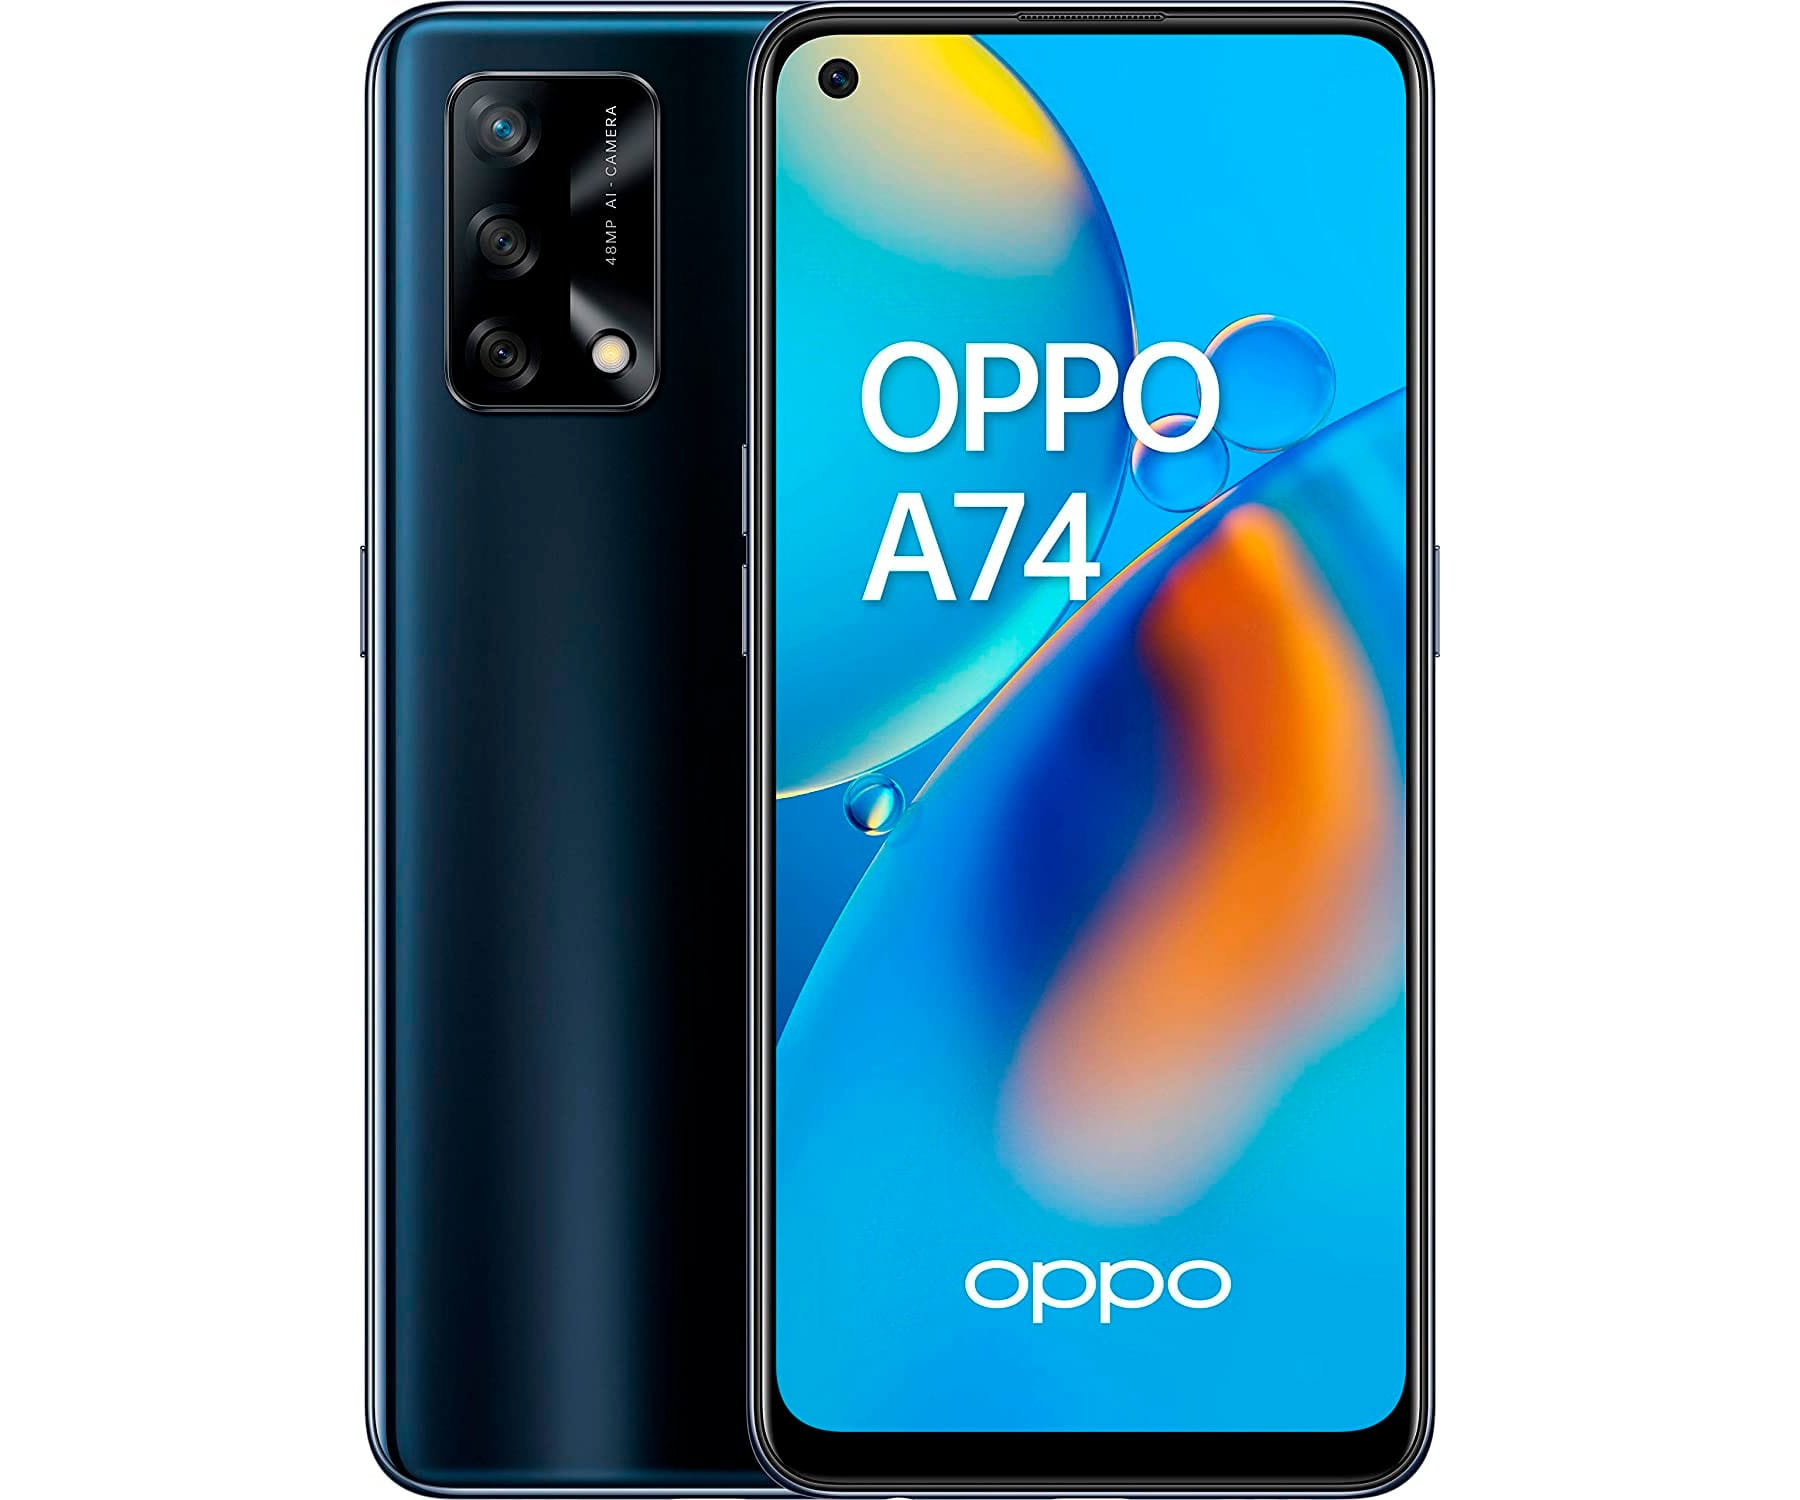 OPPO A74 BLACK MÓVIL 4G DUAL SIM 6.43'' AMOLED FHD + OCTACORE 128GB 6GB RAM TRIPLE CAMARA 48MP IA SELFIES 16MP